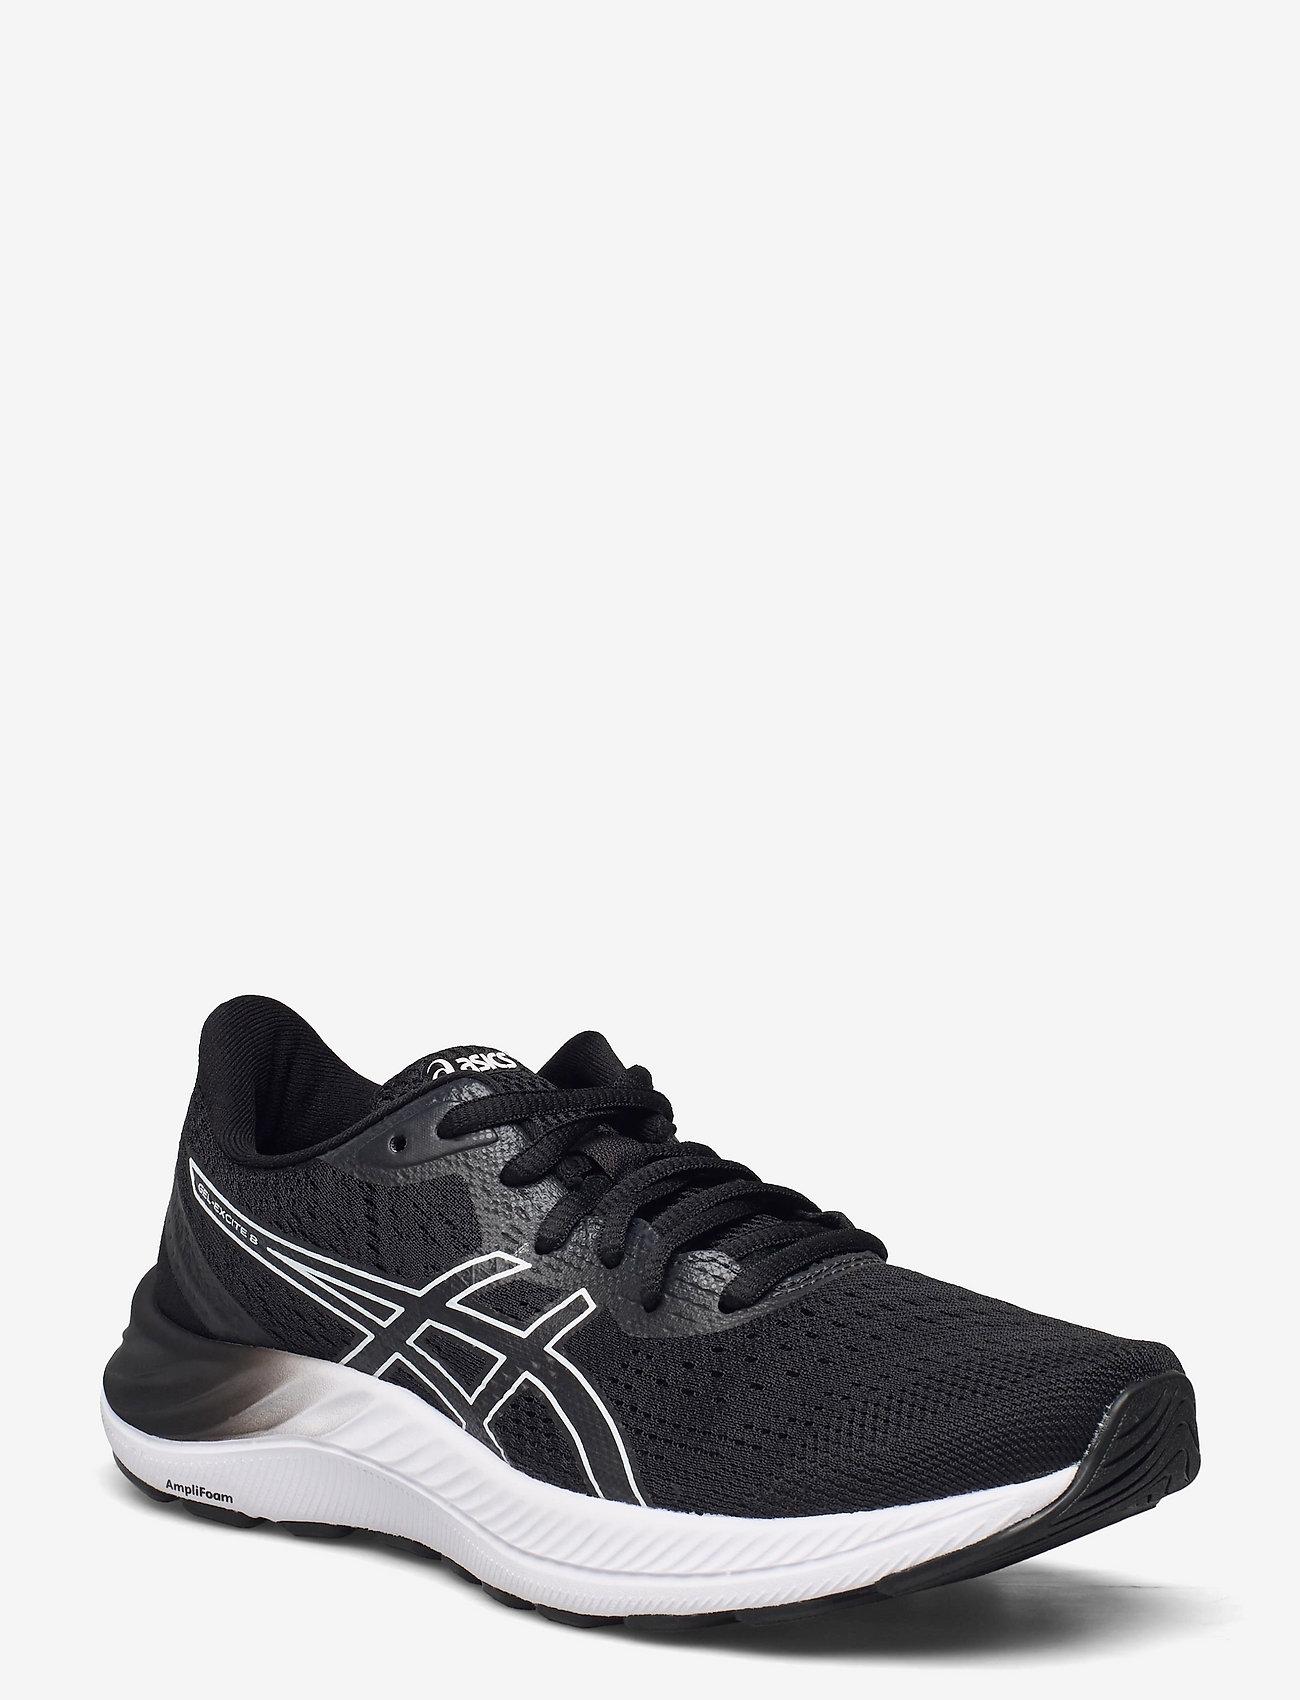 Asics - GEL-EXCITE 8 - running shoes - black/white - 0